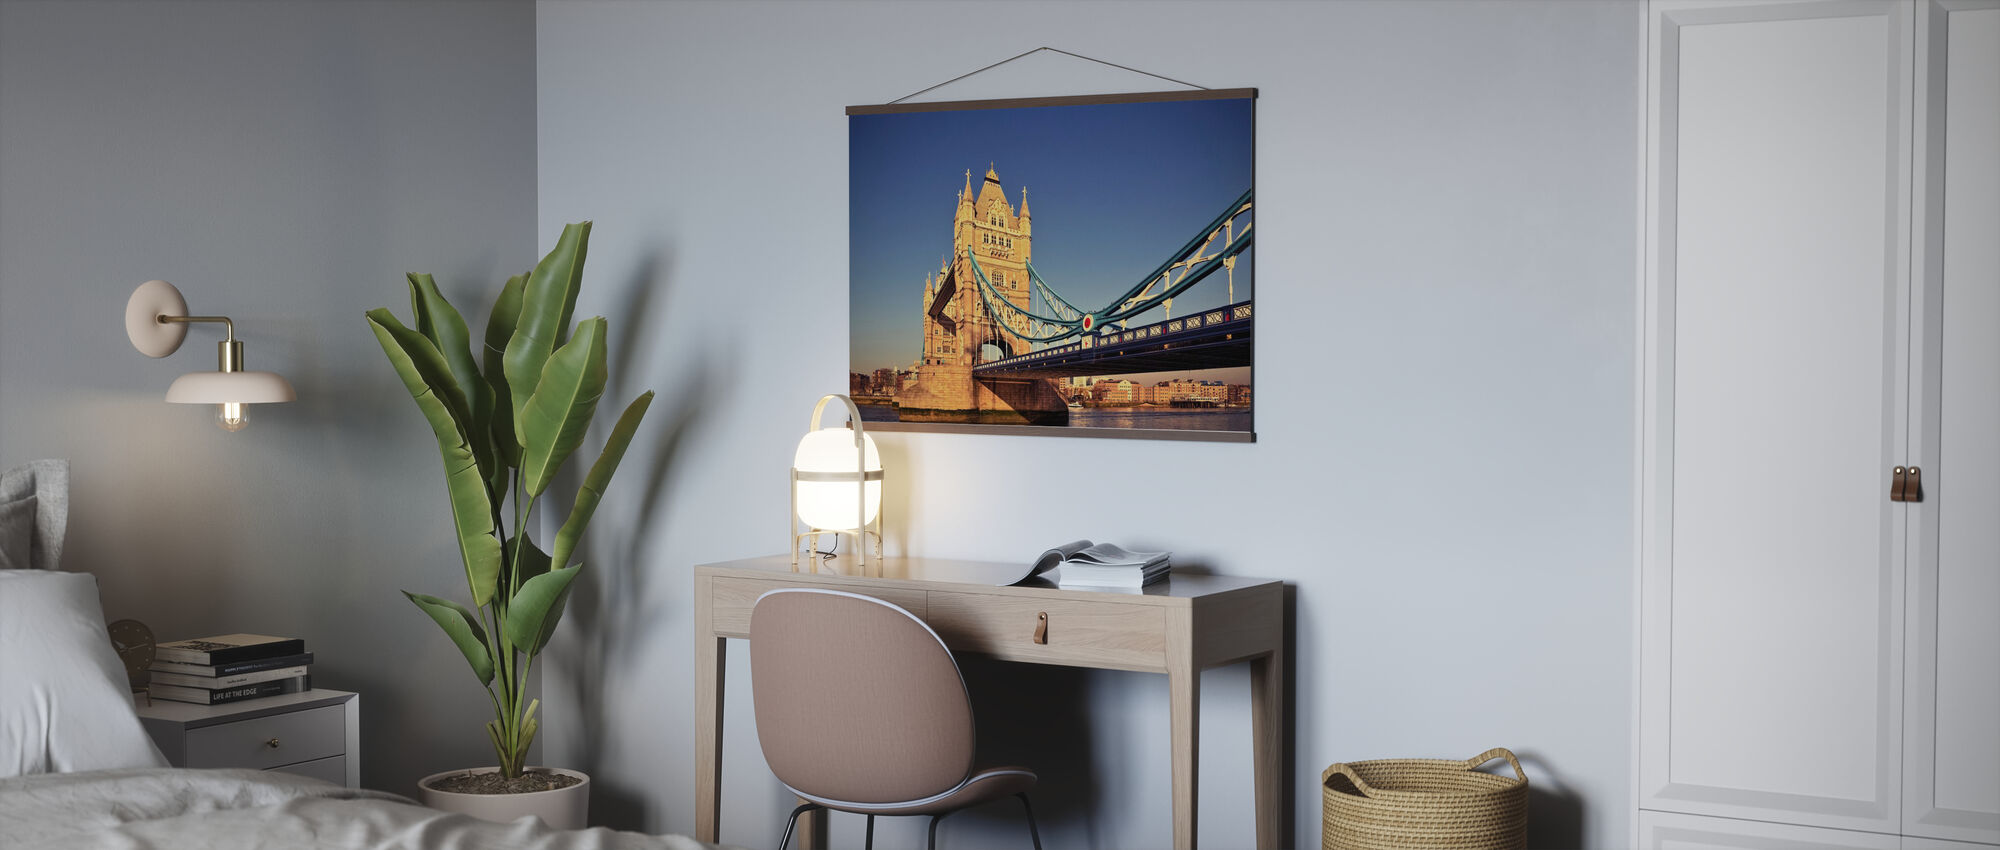 Tower Bridge in Sunshine - Poster - Office